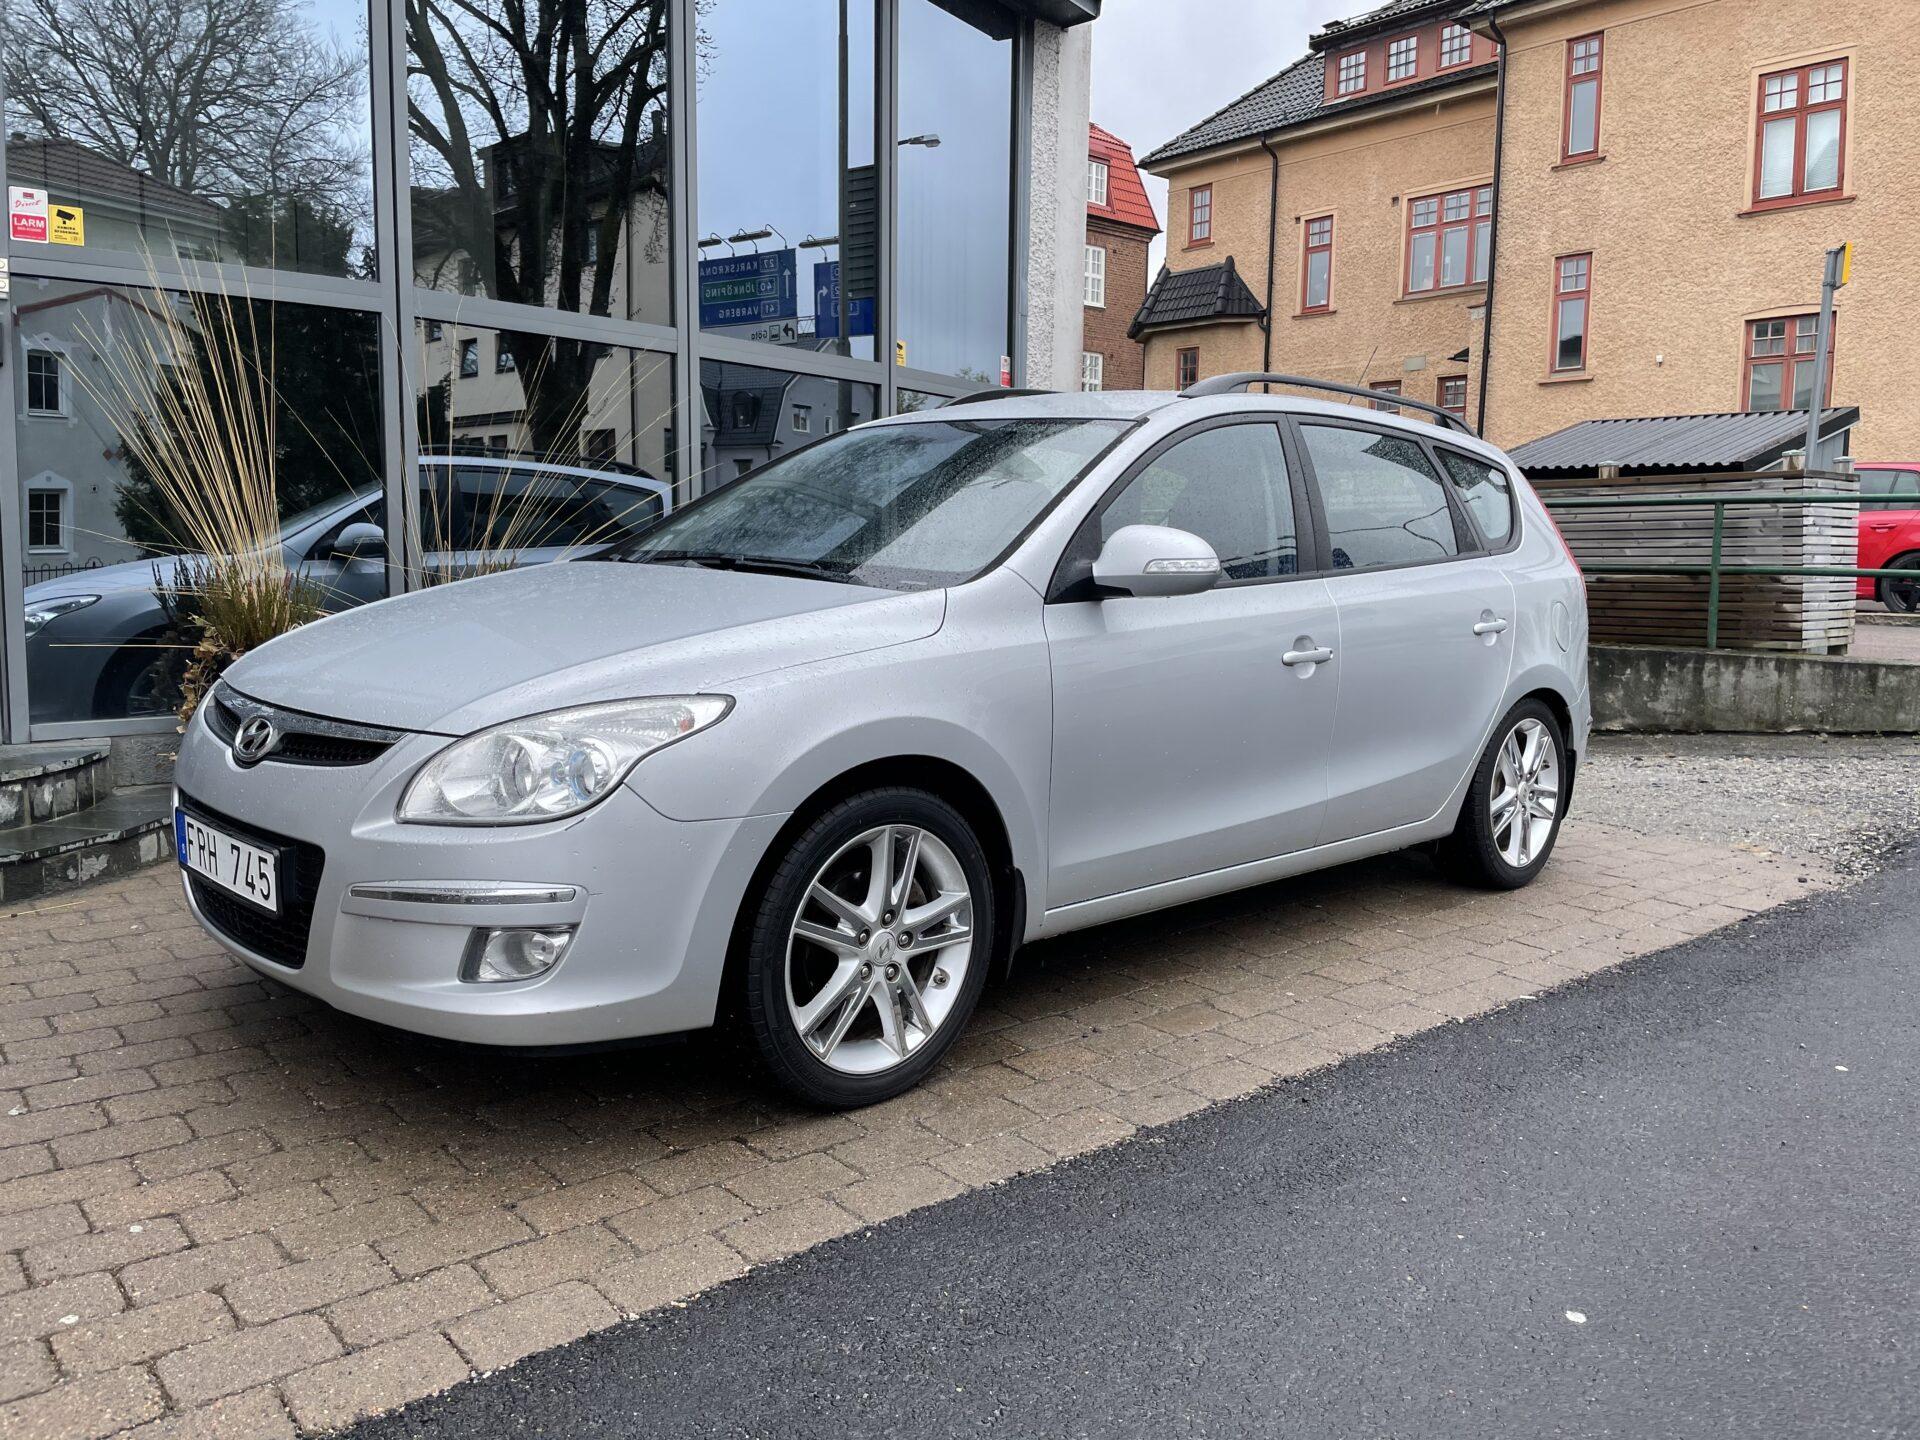 Hyundai i30 cw 2.0 143hk / Drag / V-hjul / Nybesiktigad